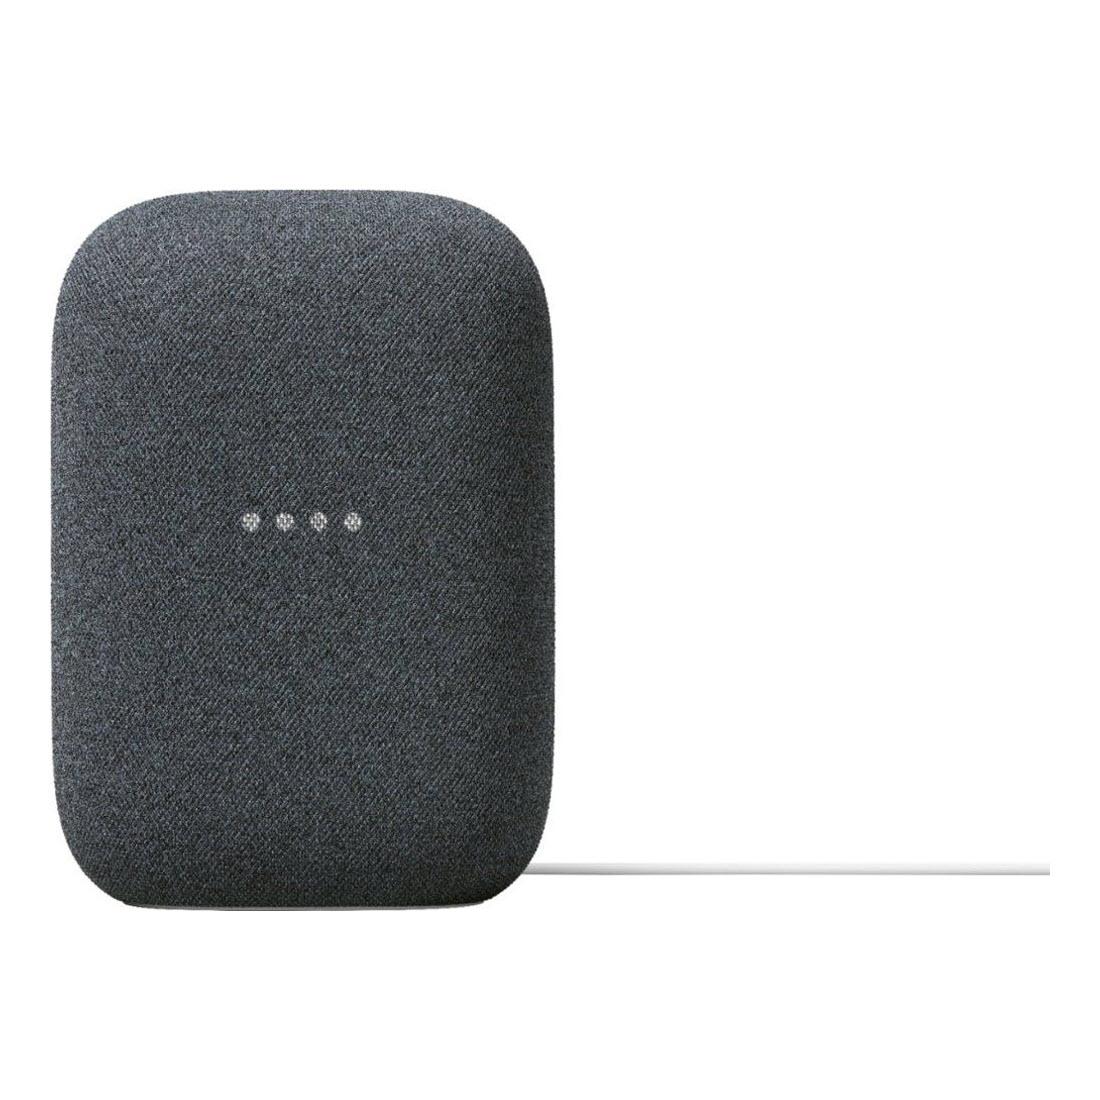 Google Nest Audio Smart Speaker Charcoal (5)